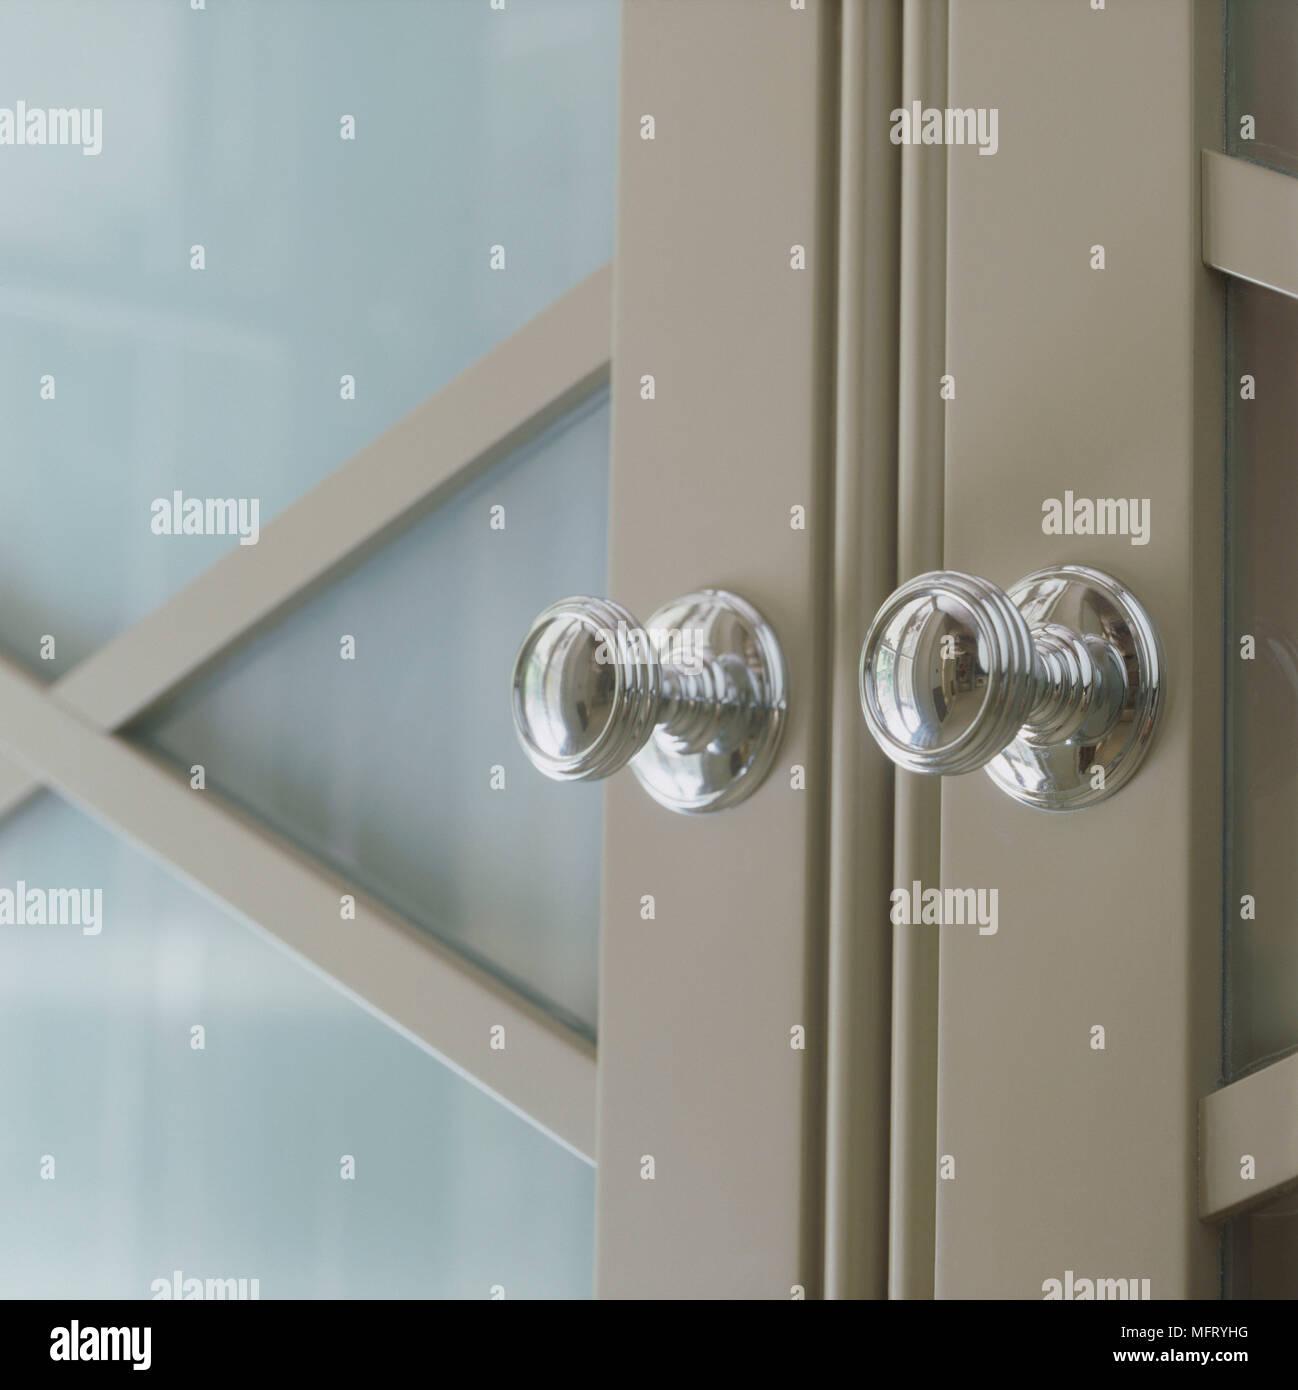 Chrome Cabinet Handles Stock Photos & Chrome Cabinet Handles Stock ...